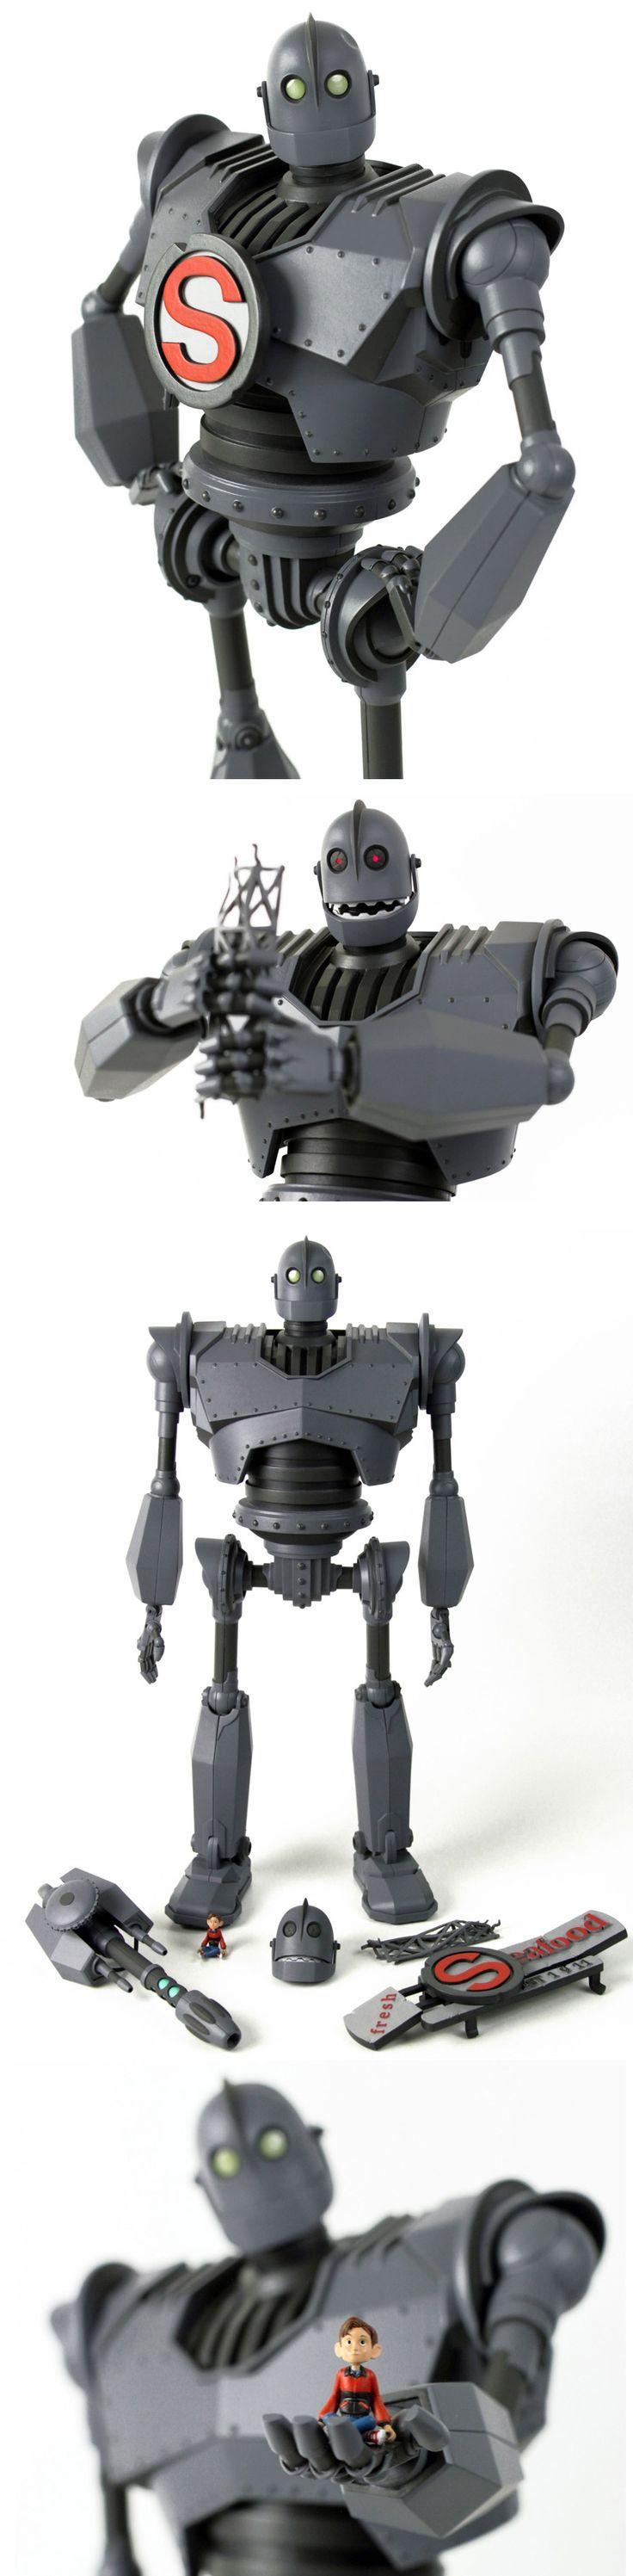 The Iron Giant Deluxe Figure by Mondo: